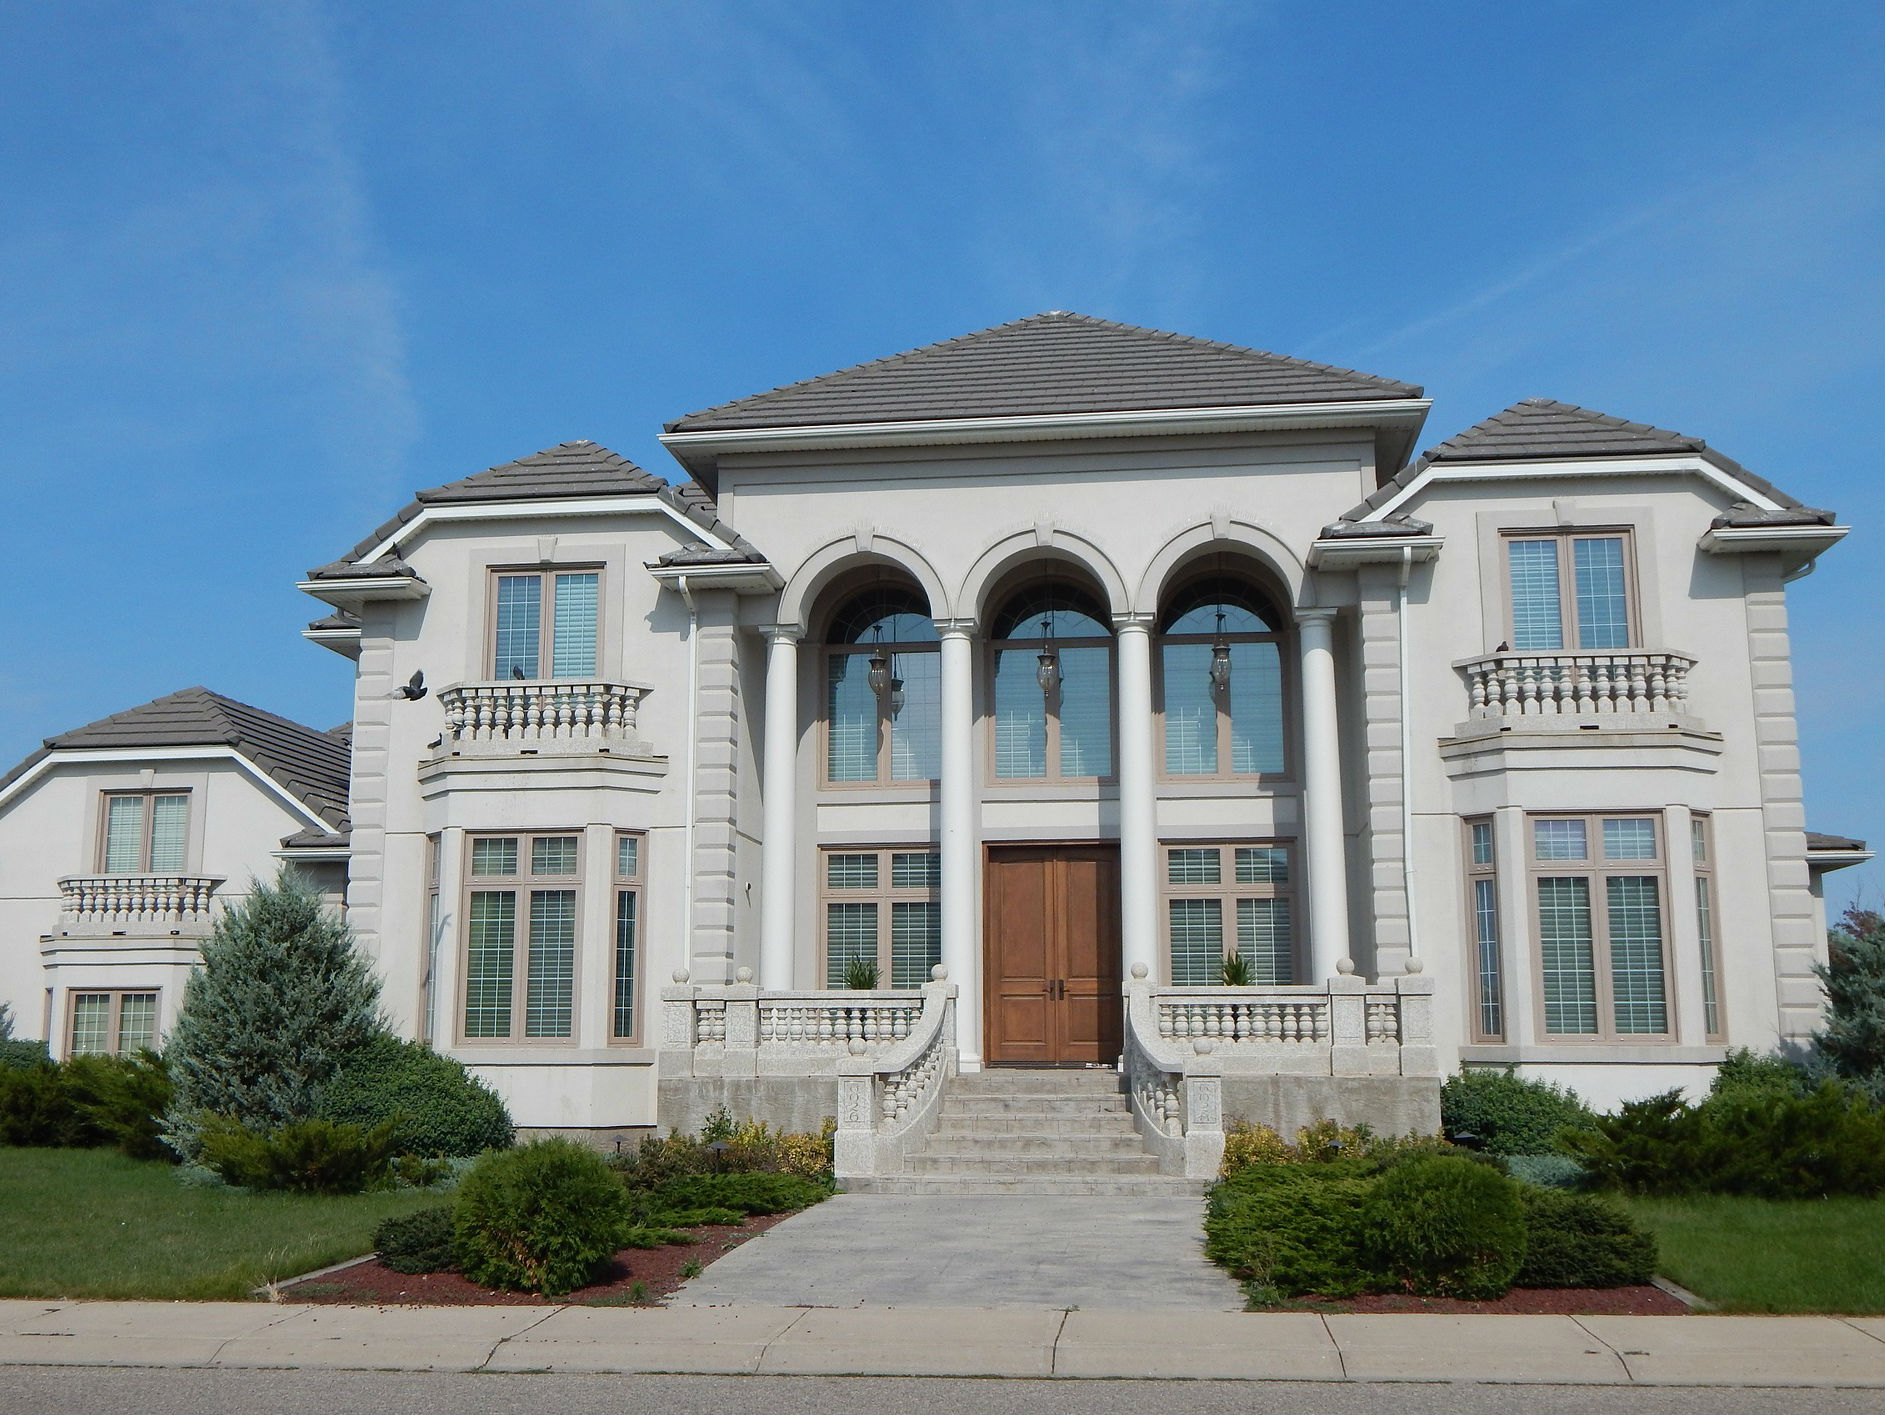 mansion-4x3.jpg